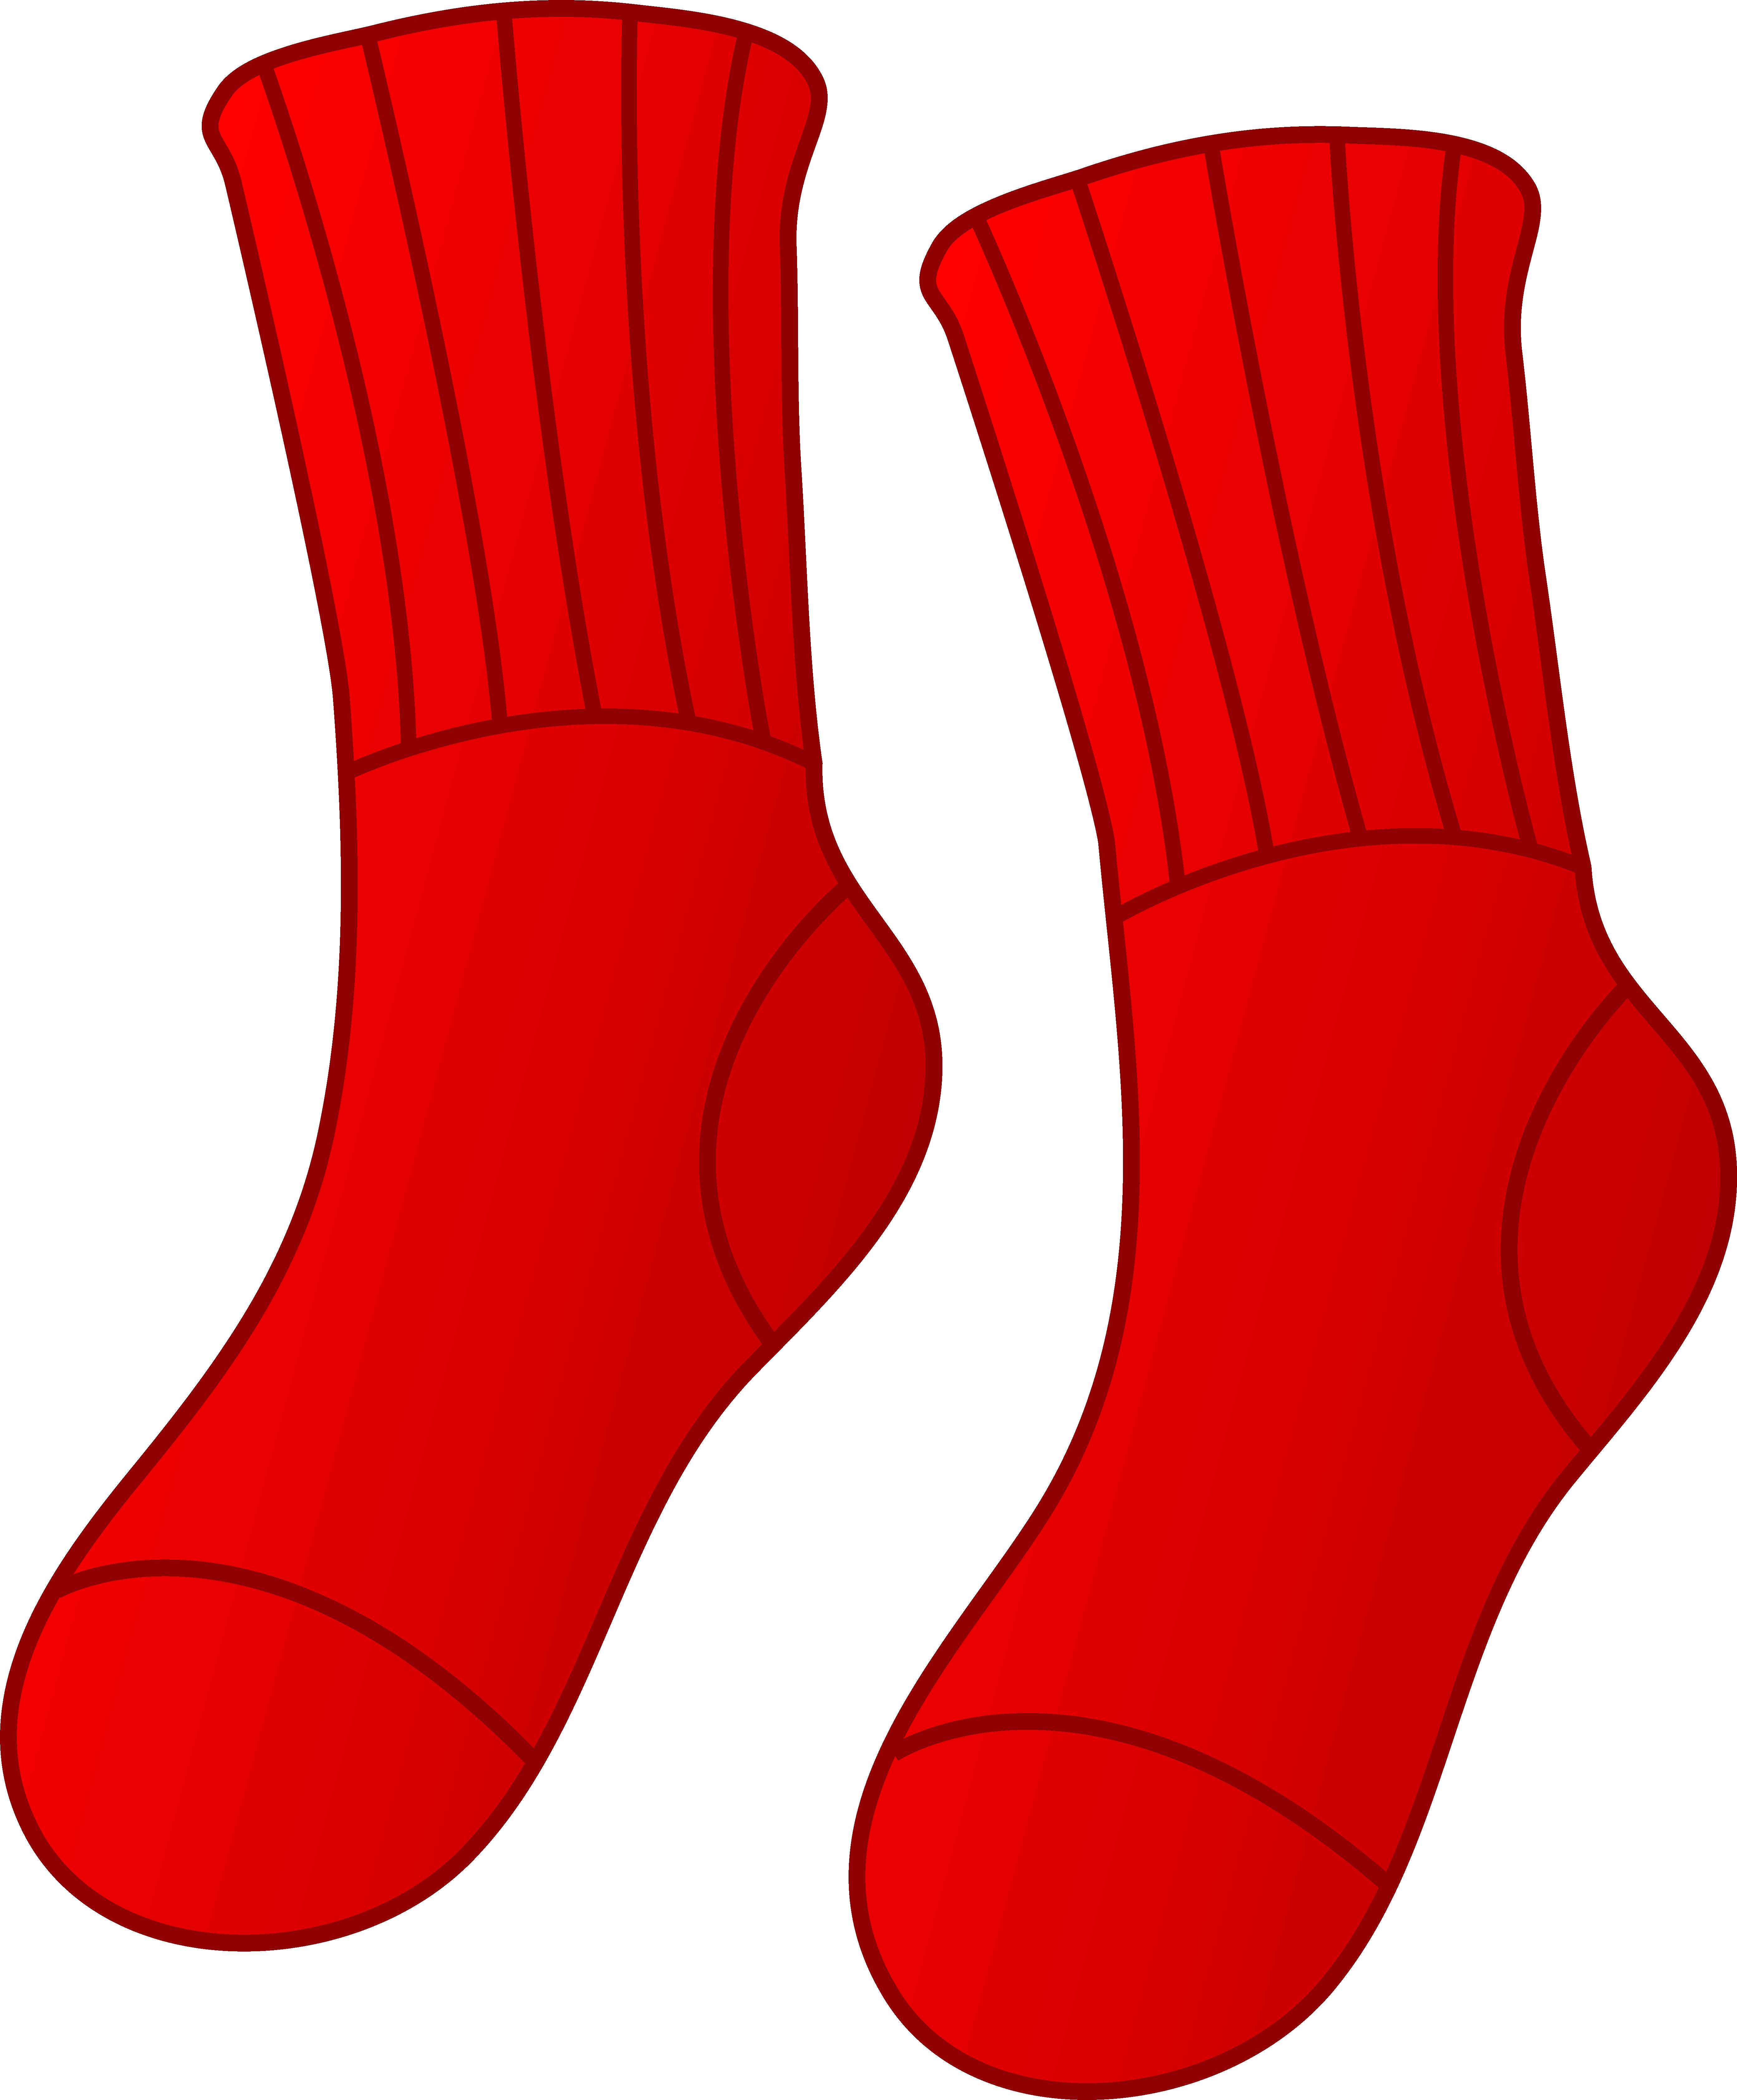 Red socks clip art.